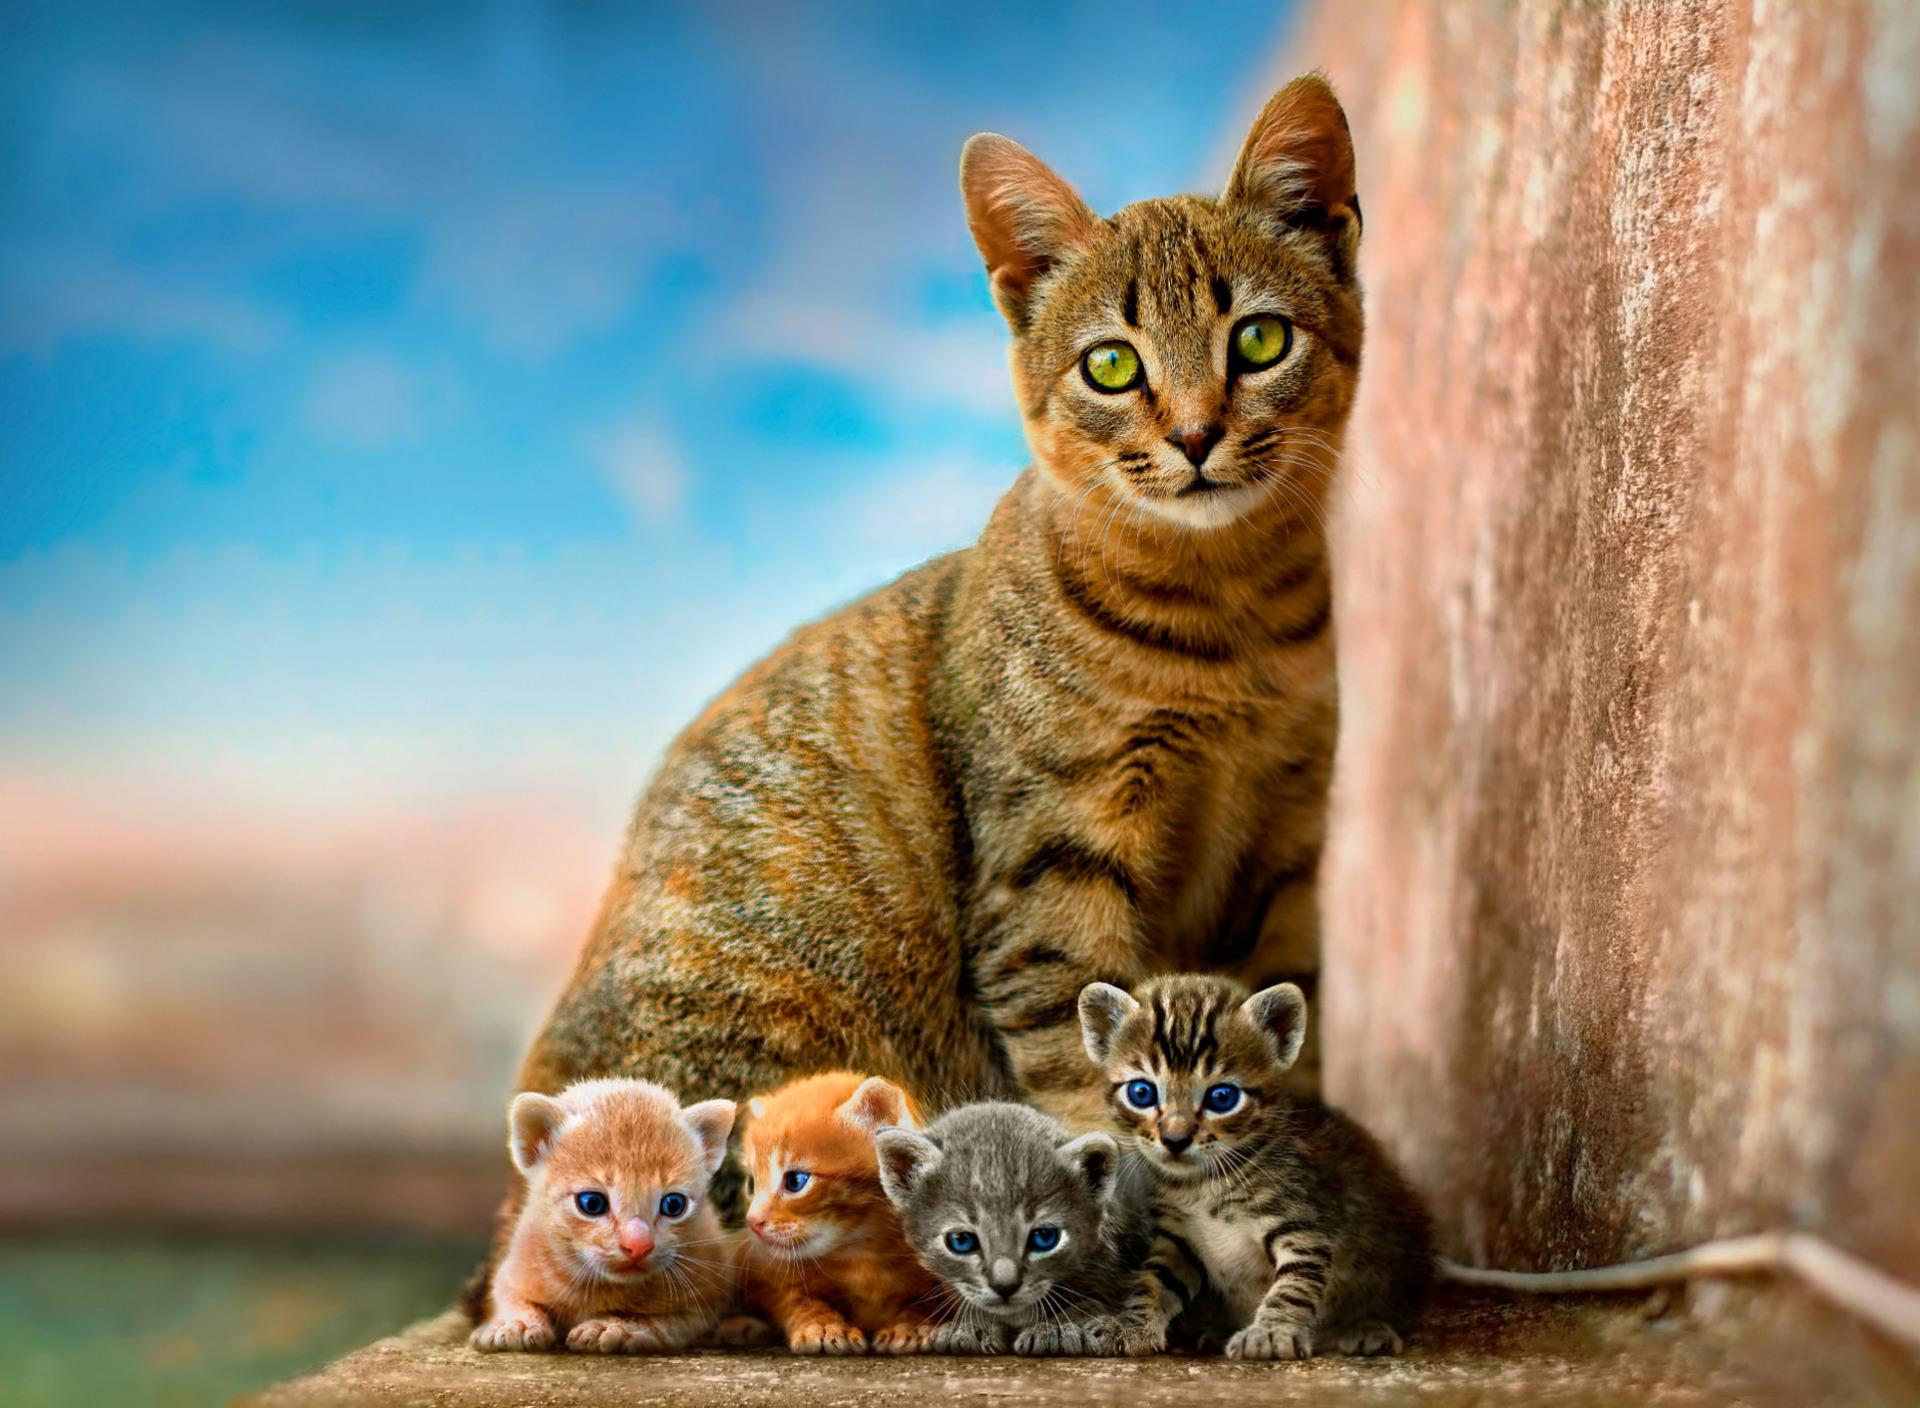 отечества картинки с четырьмя котятами думаю